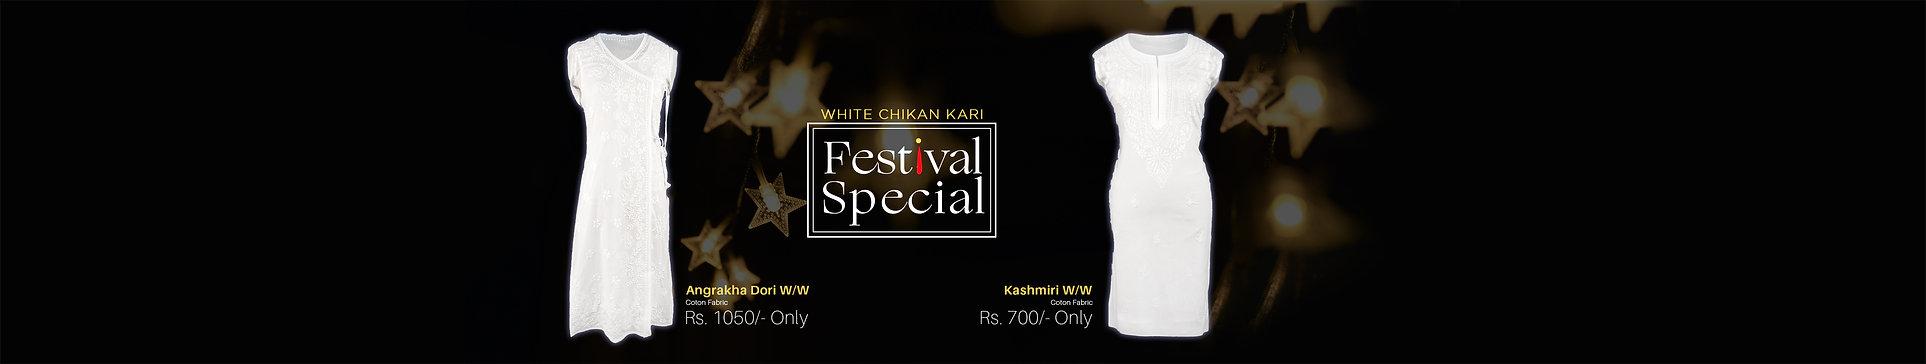 Festival Special White Chikan Kari Kurti